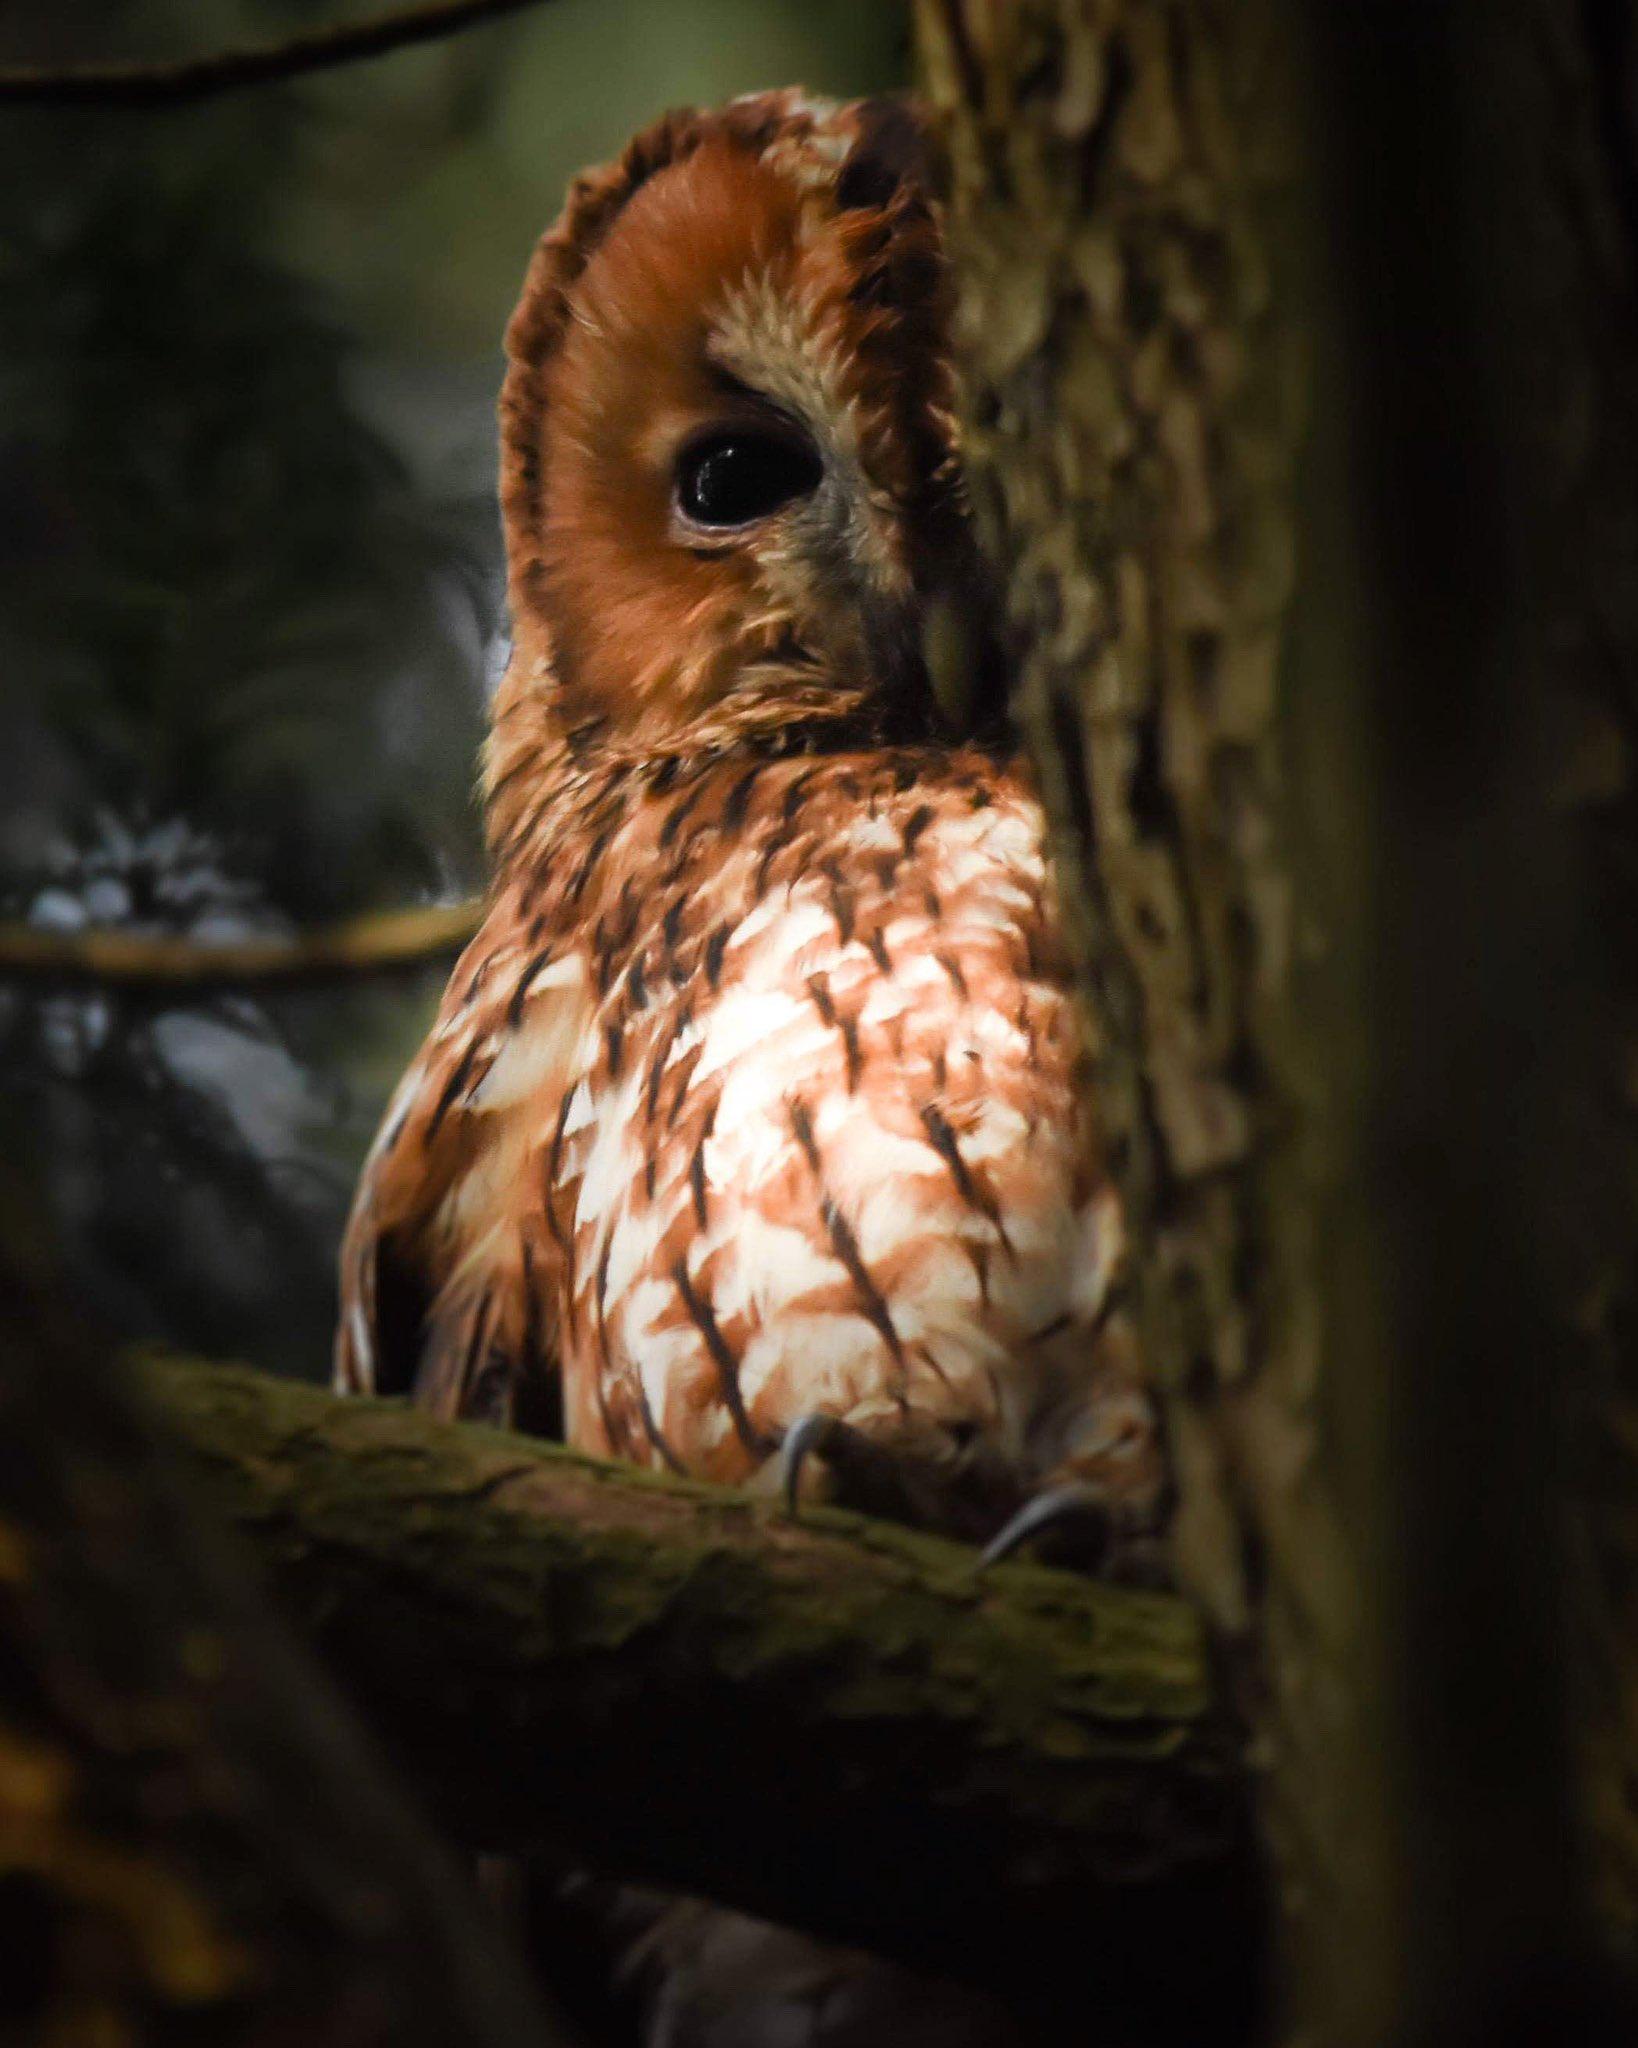 wildlife_photography_30.jpg